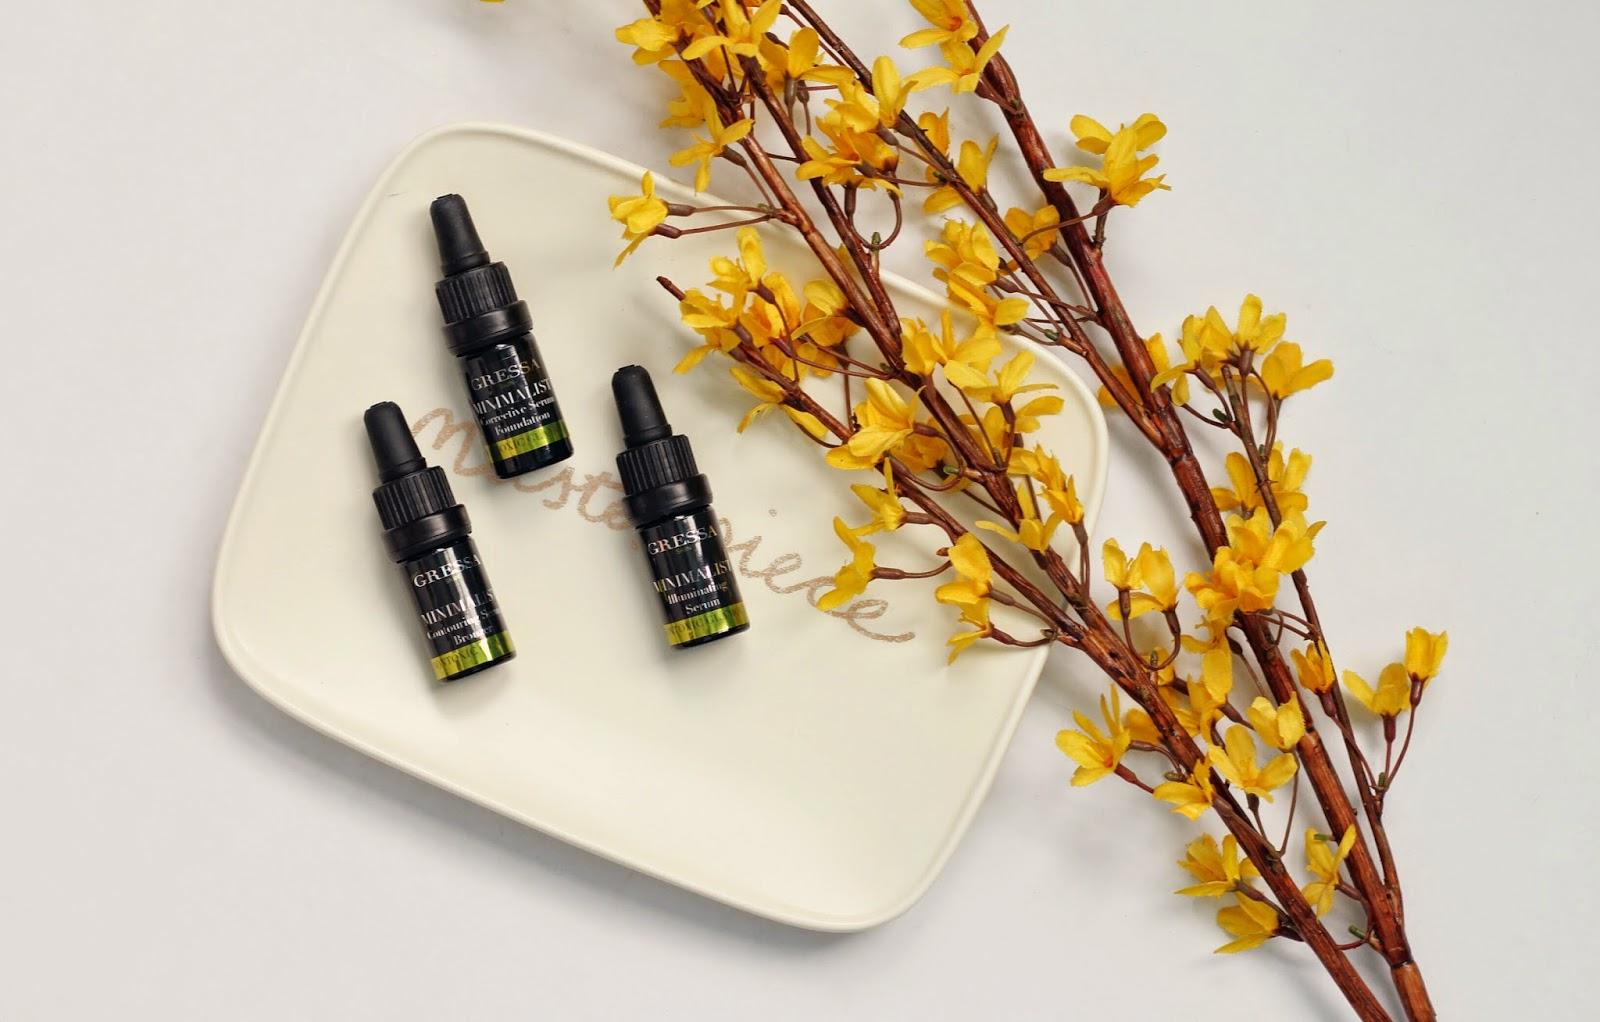 gressa minimalist serum foundation, gressa minimalist illuminating serum, gressa contour bronzing serum